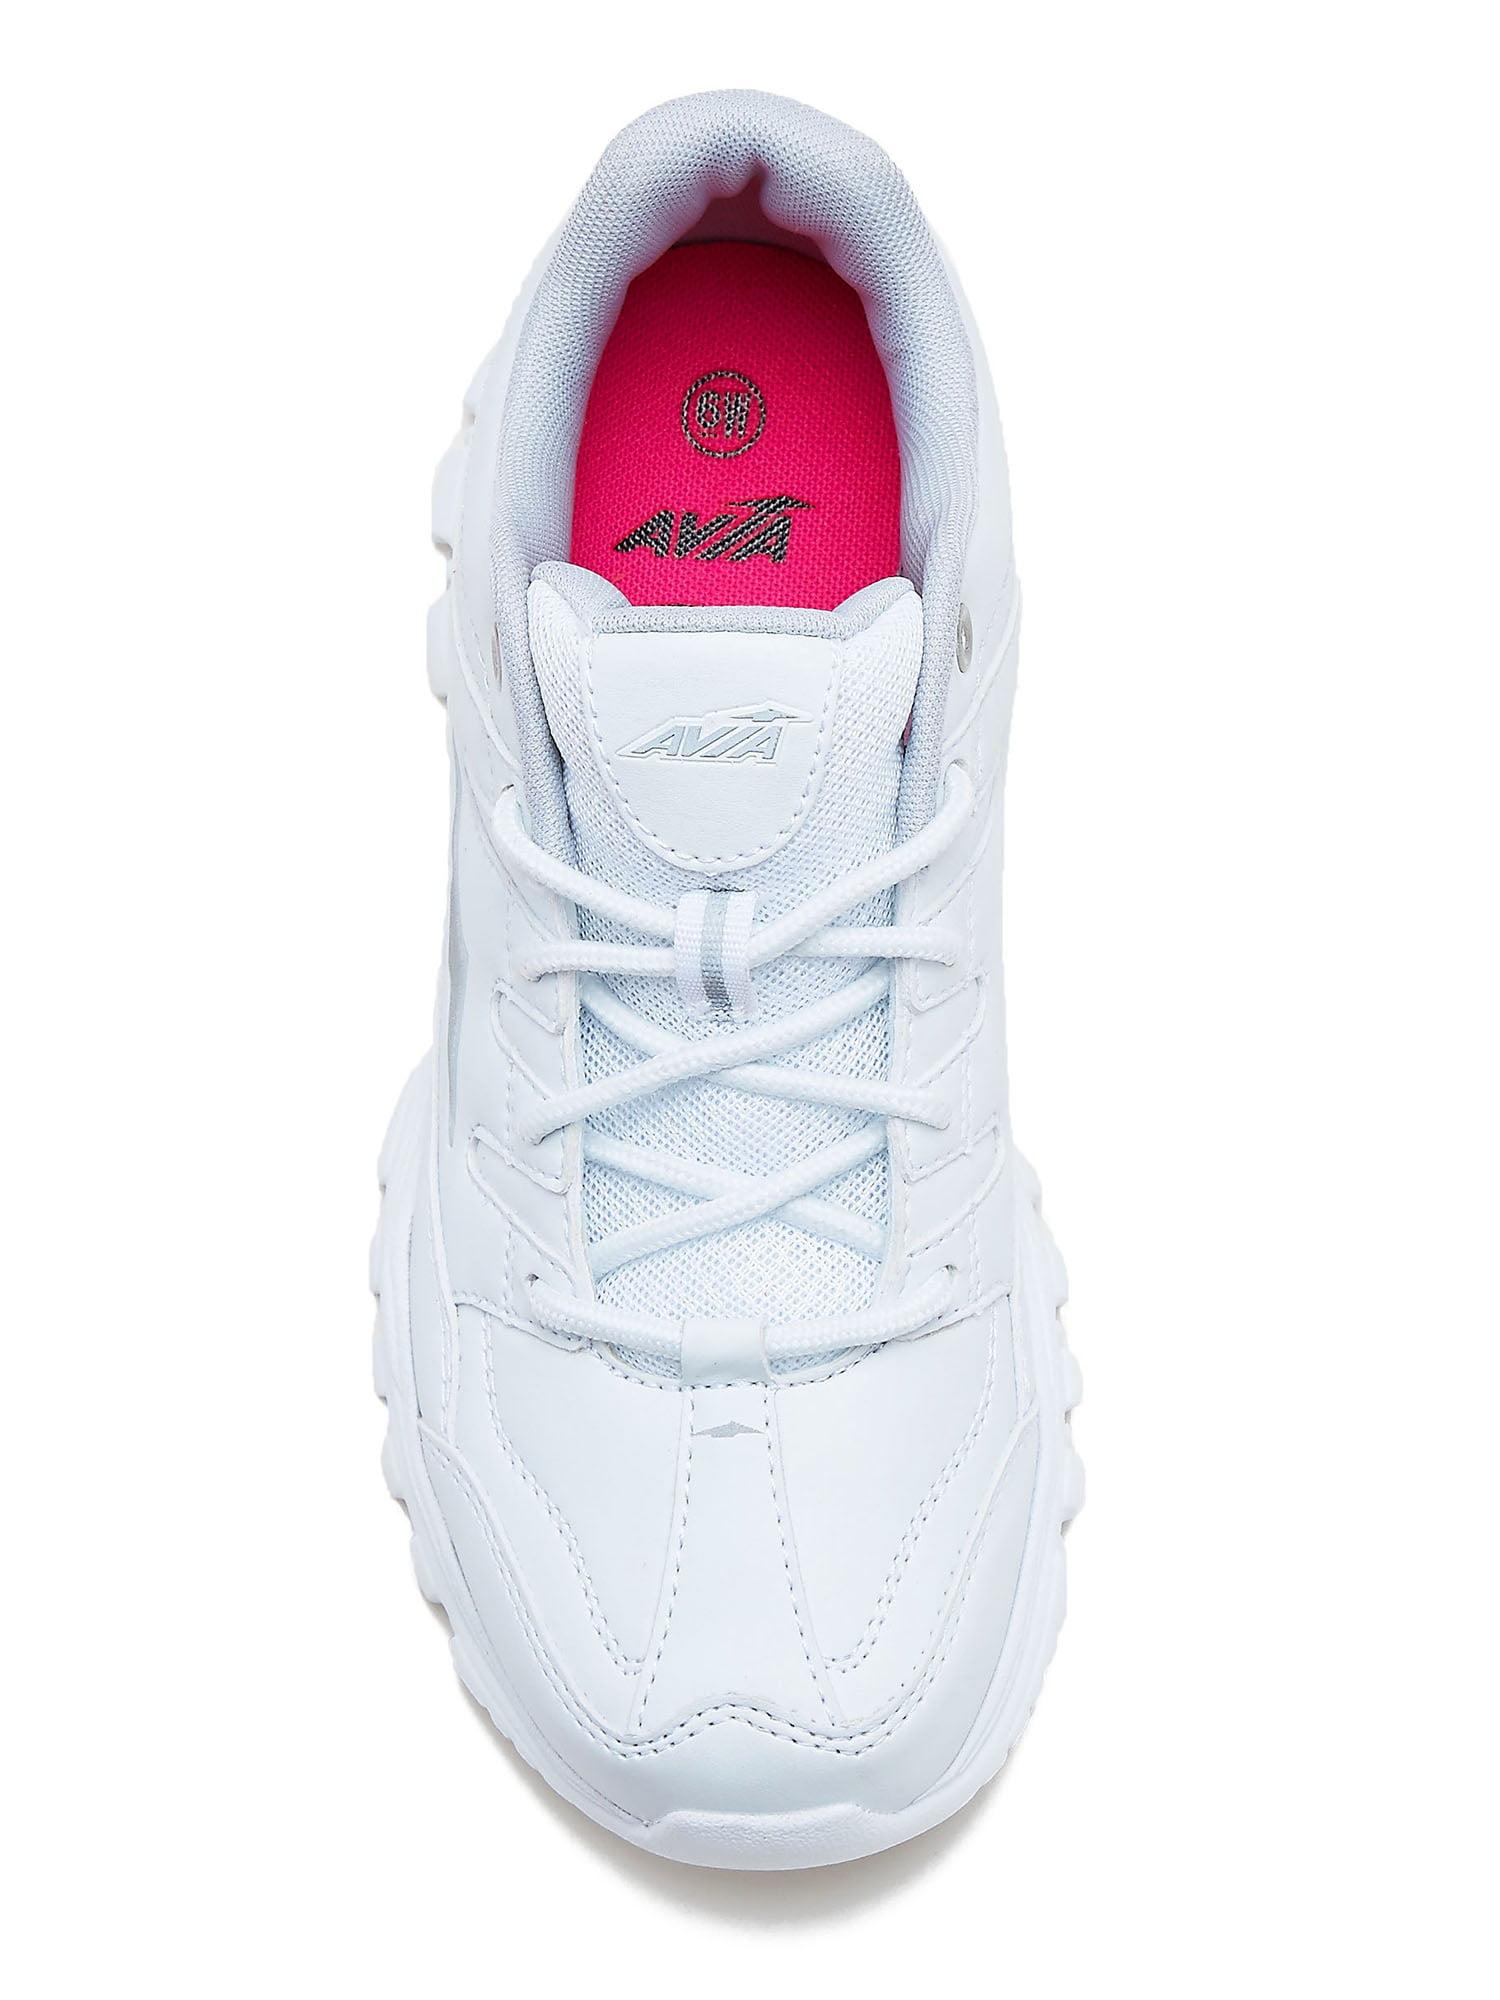 b58692f8222 Avia - Avia Women s Achieve Wide Width Walking Shoe - Walmart.com